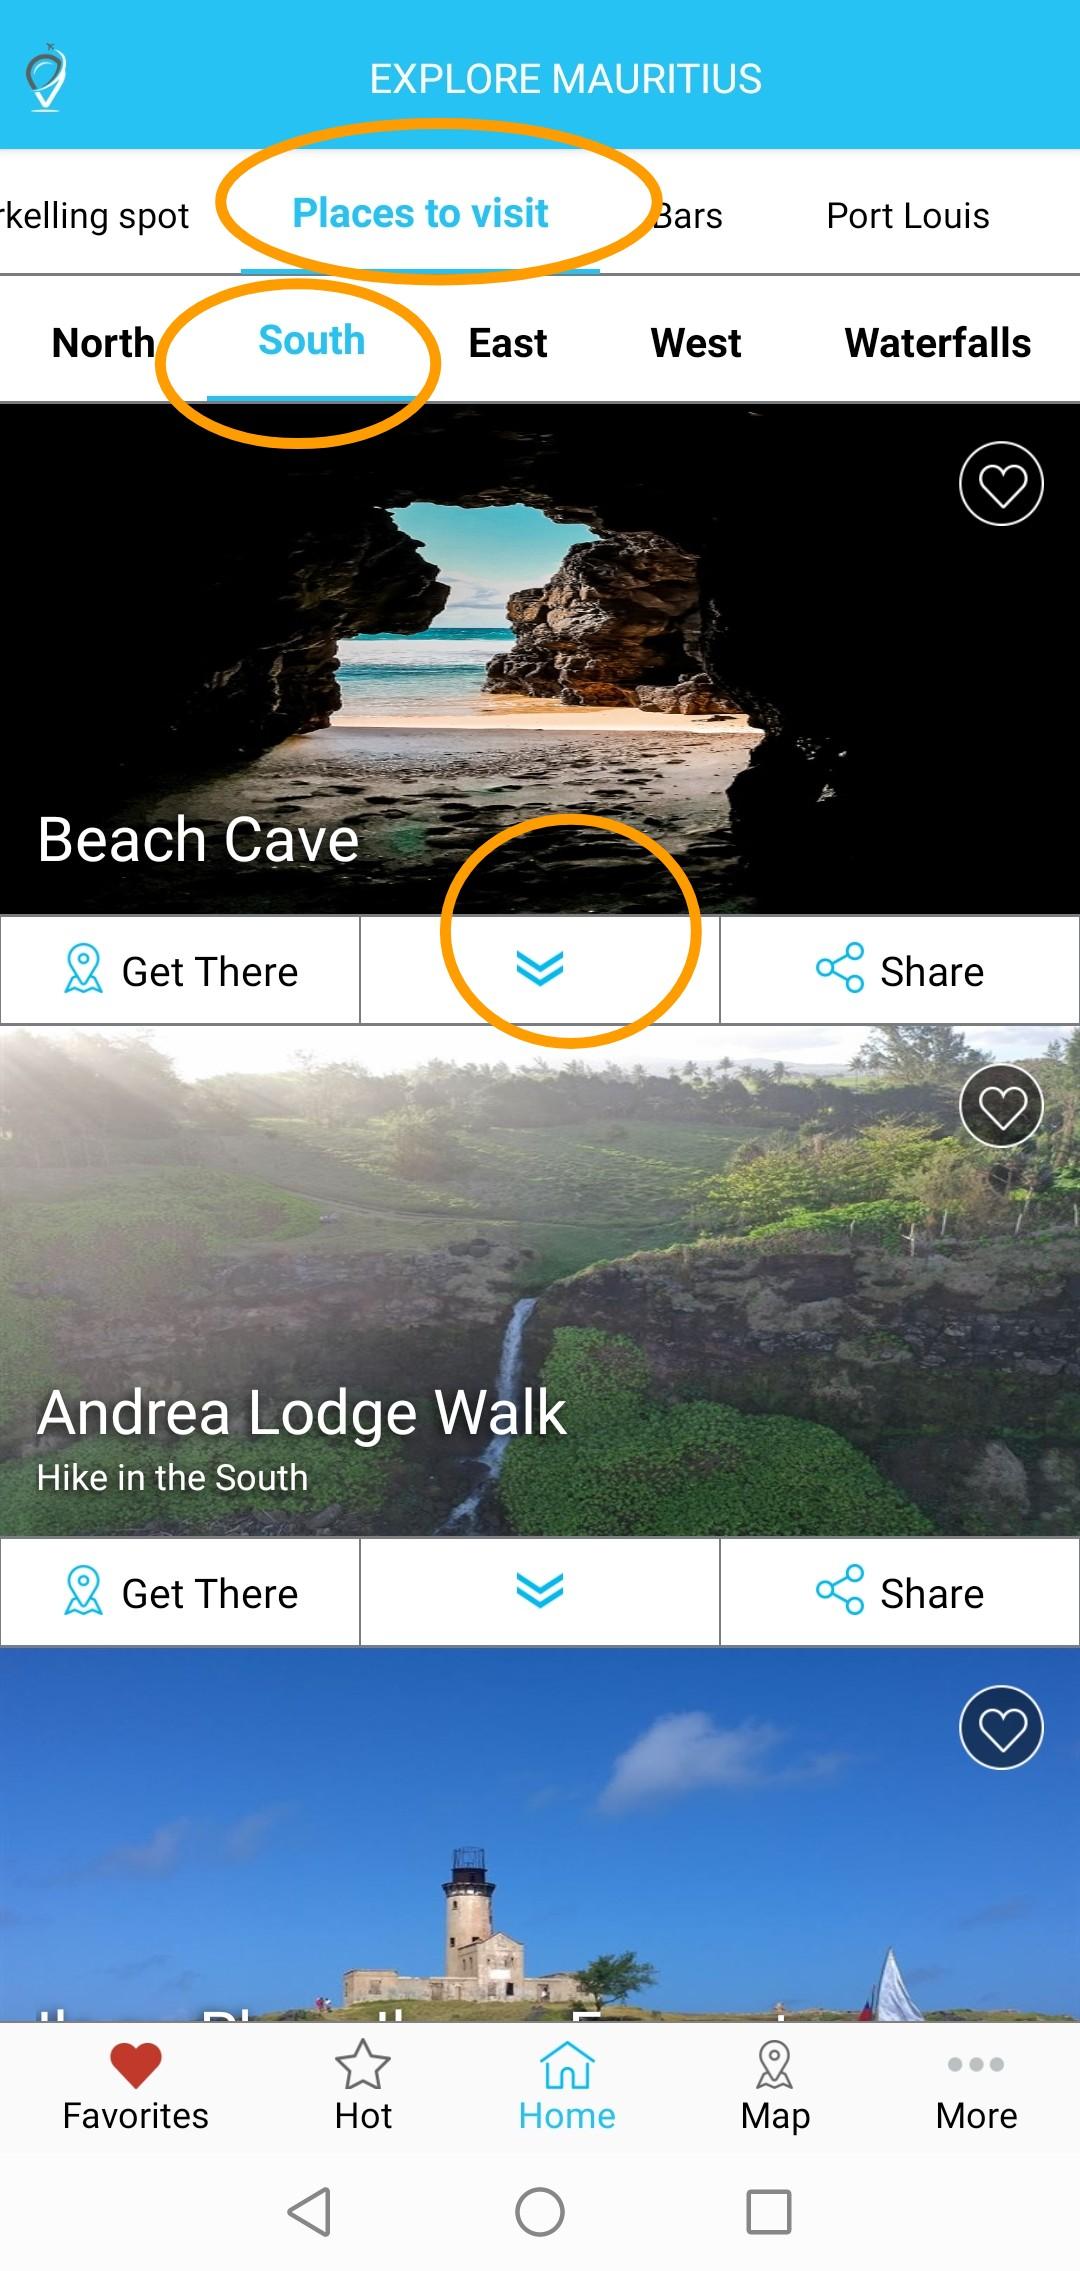 Beach cave location